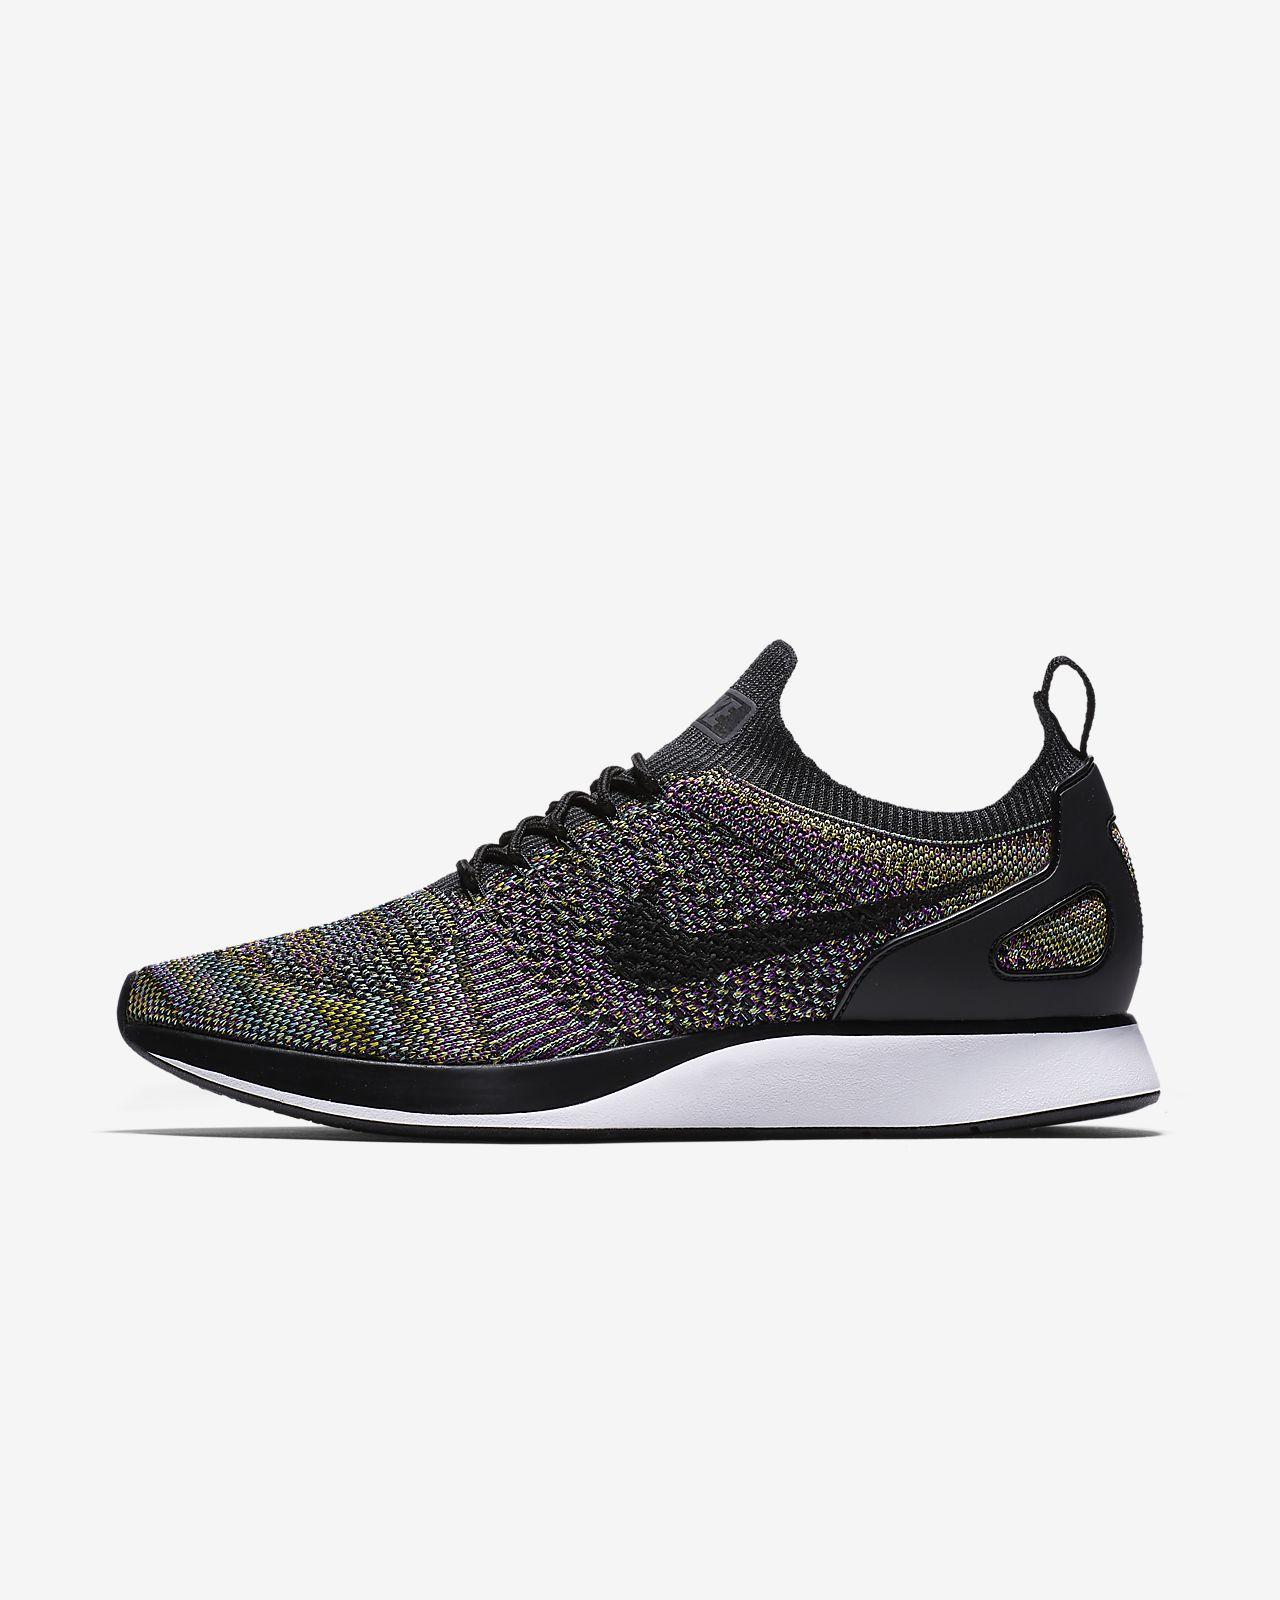 ... Nike Air Zoom Mariah Flyknit Racer Men's Shoe